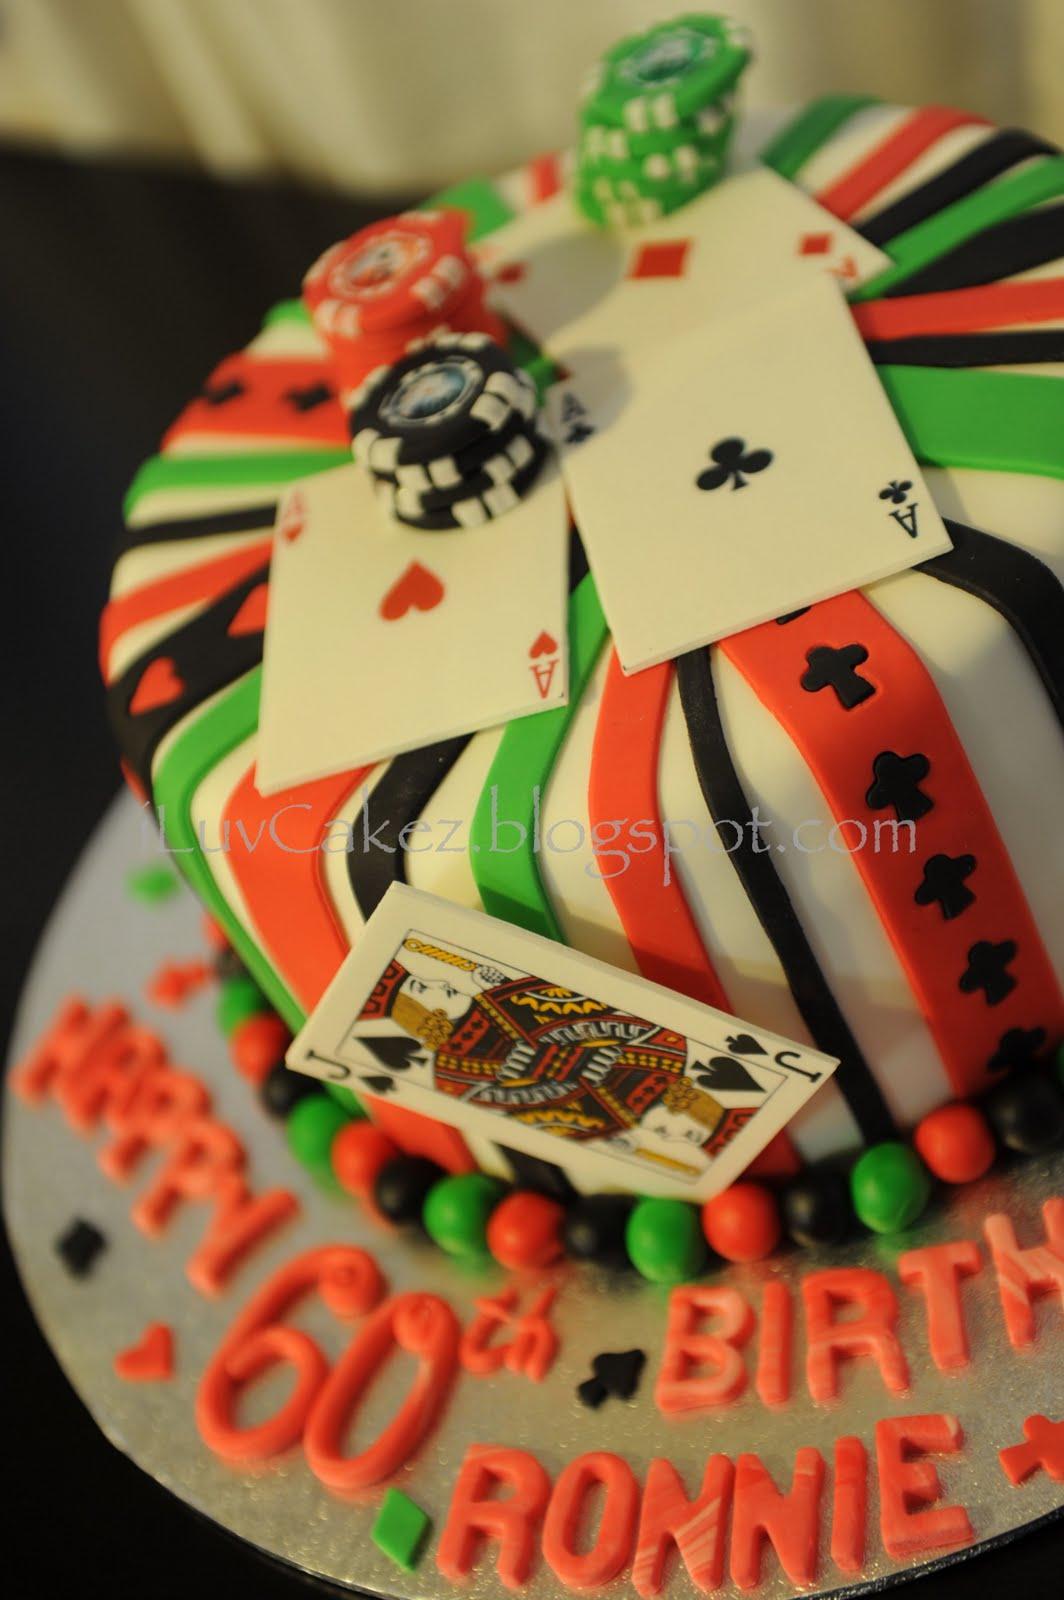 iLuv Cakez: Poker Cake (Ronnie s 60th Birthday)